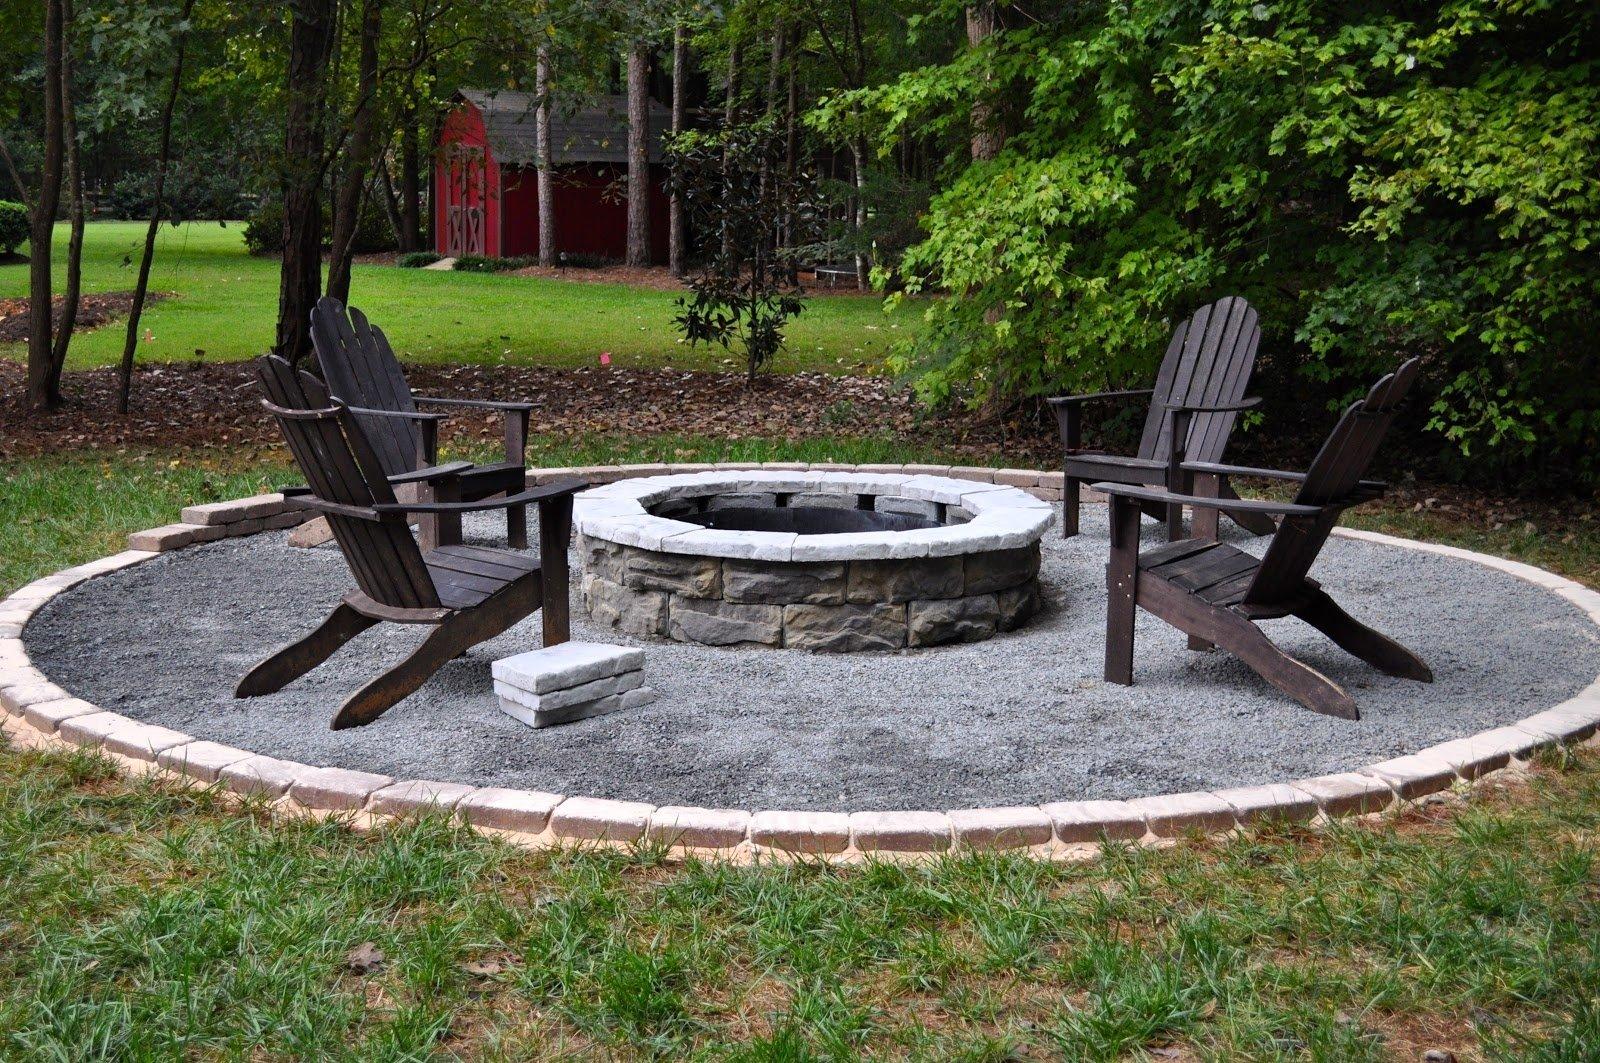 10 Beautiful Simple Backyard Fire Pit Ideas backyard fire pit designs deboto home design the best fire pit 2021